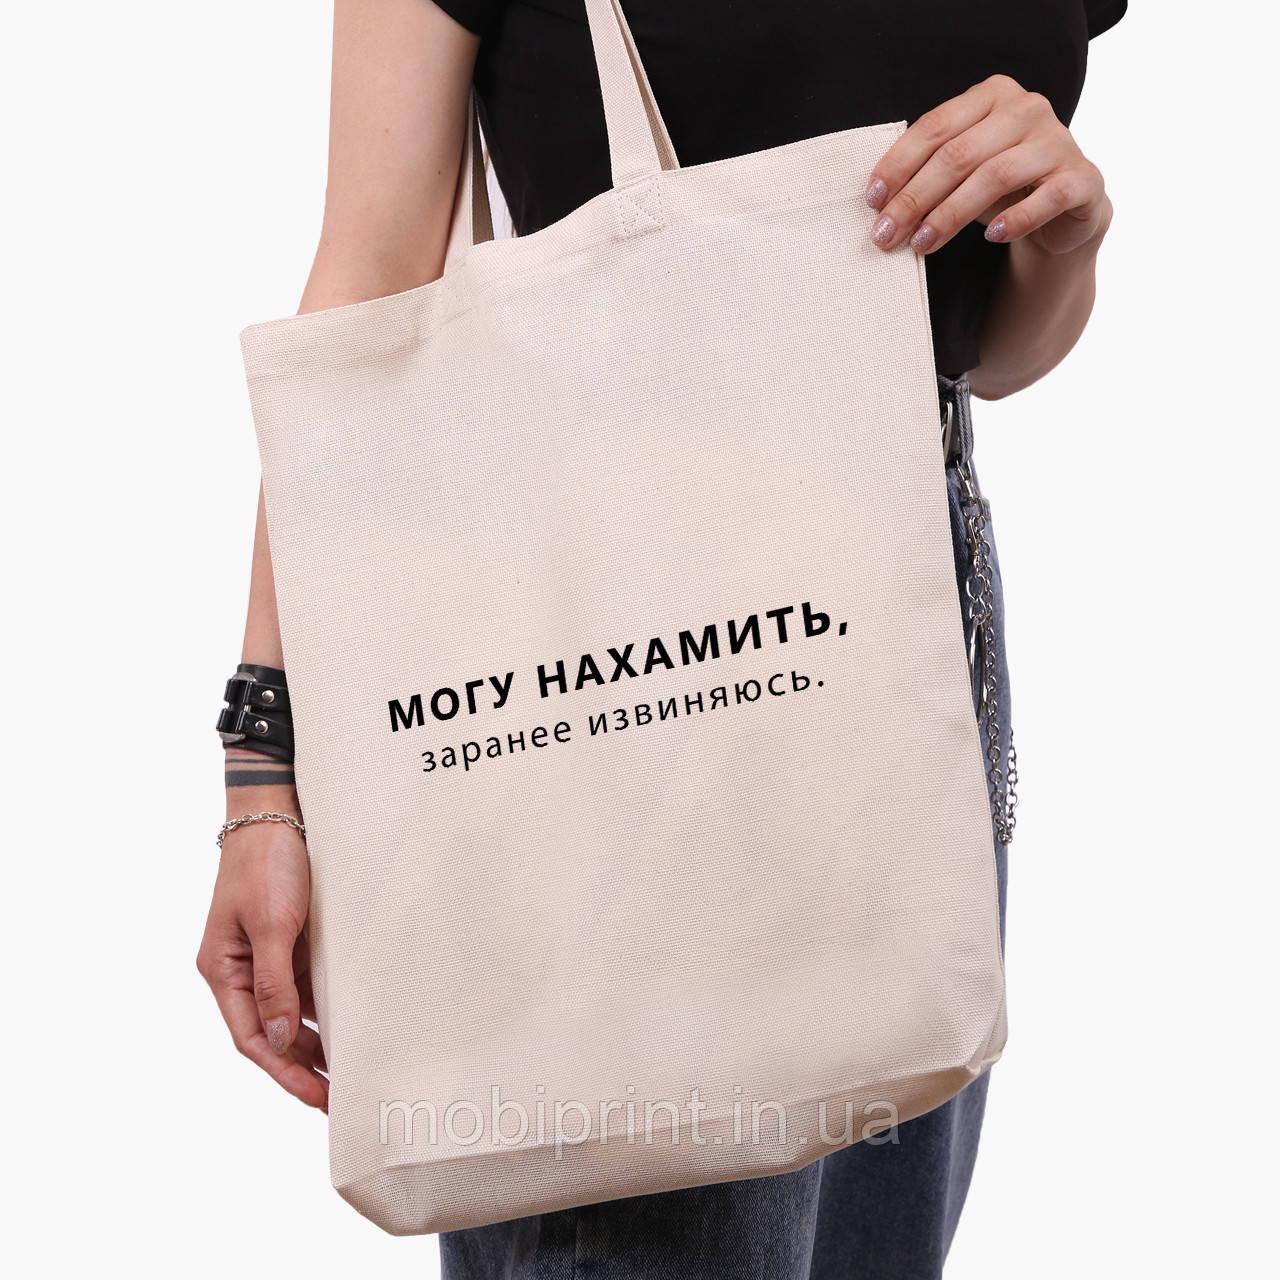 Эко сумка шоппер белая Могу нахамить (9227-1791-1) экосумка шопер 41*39*8 см